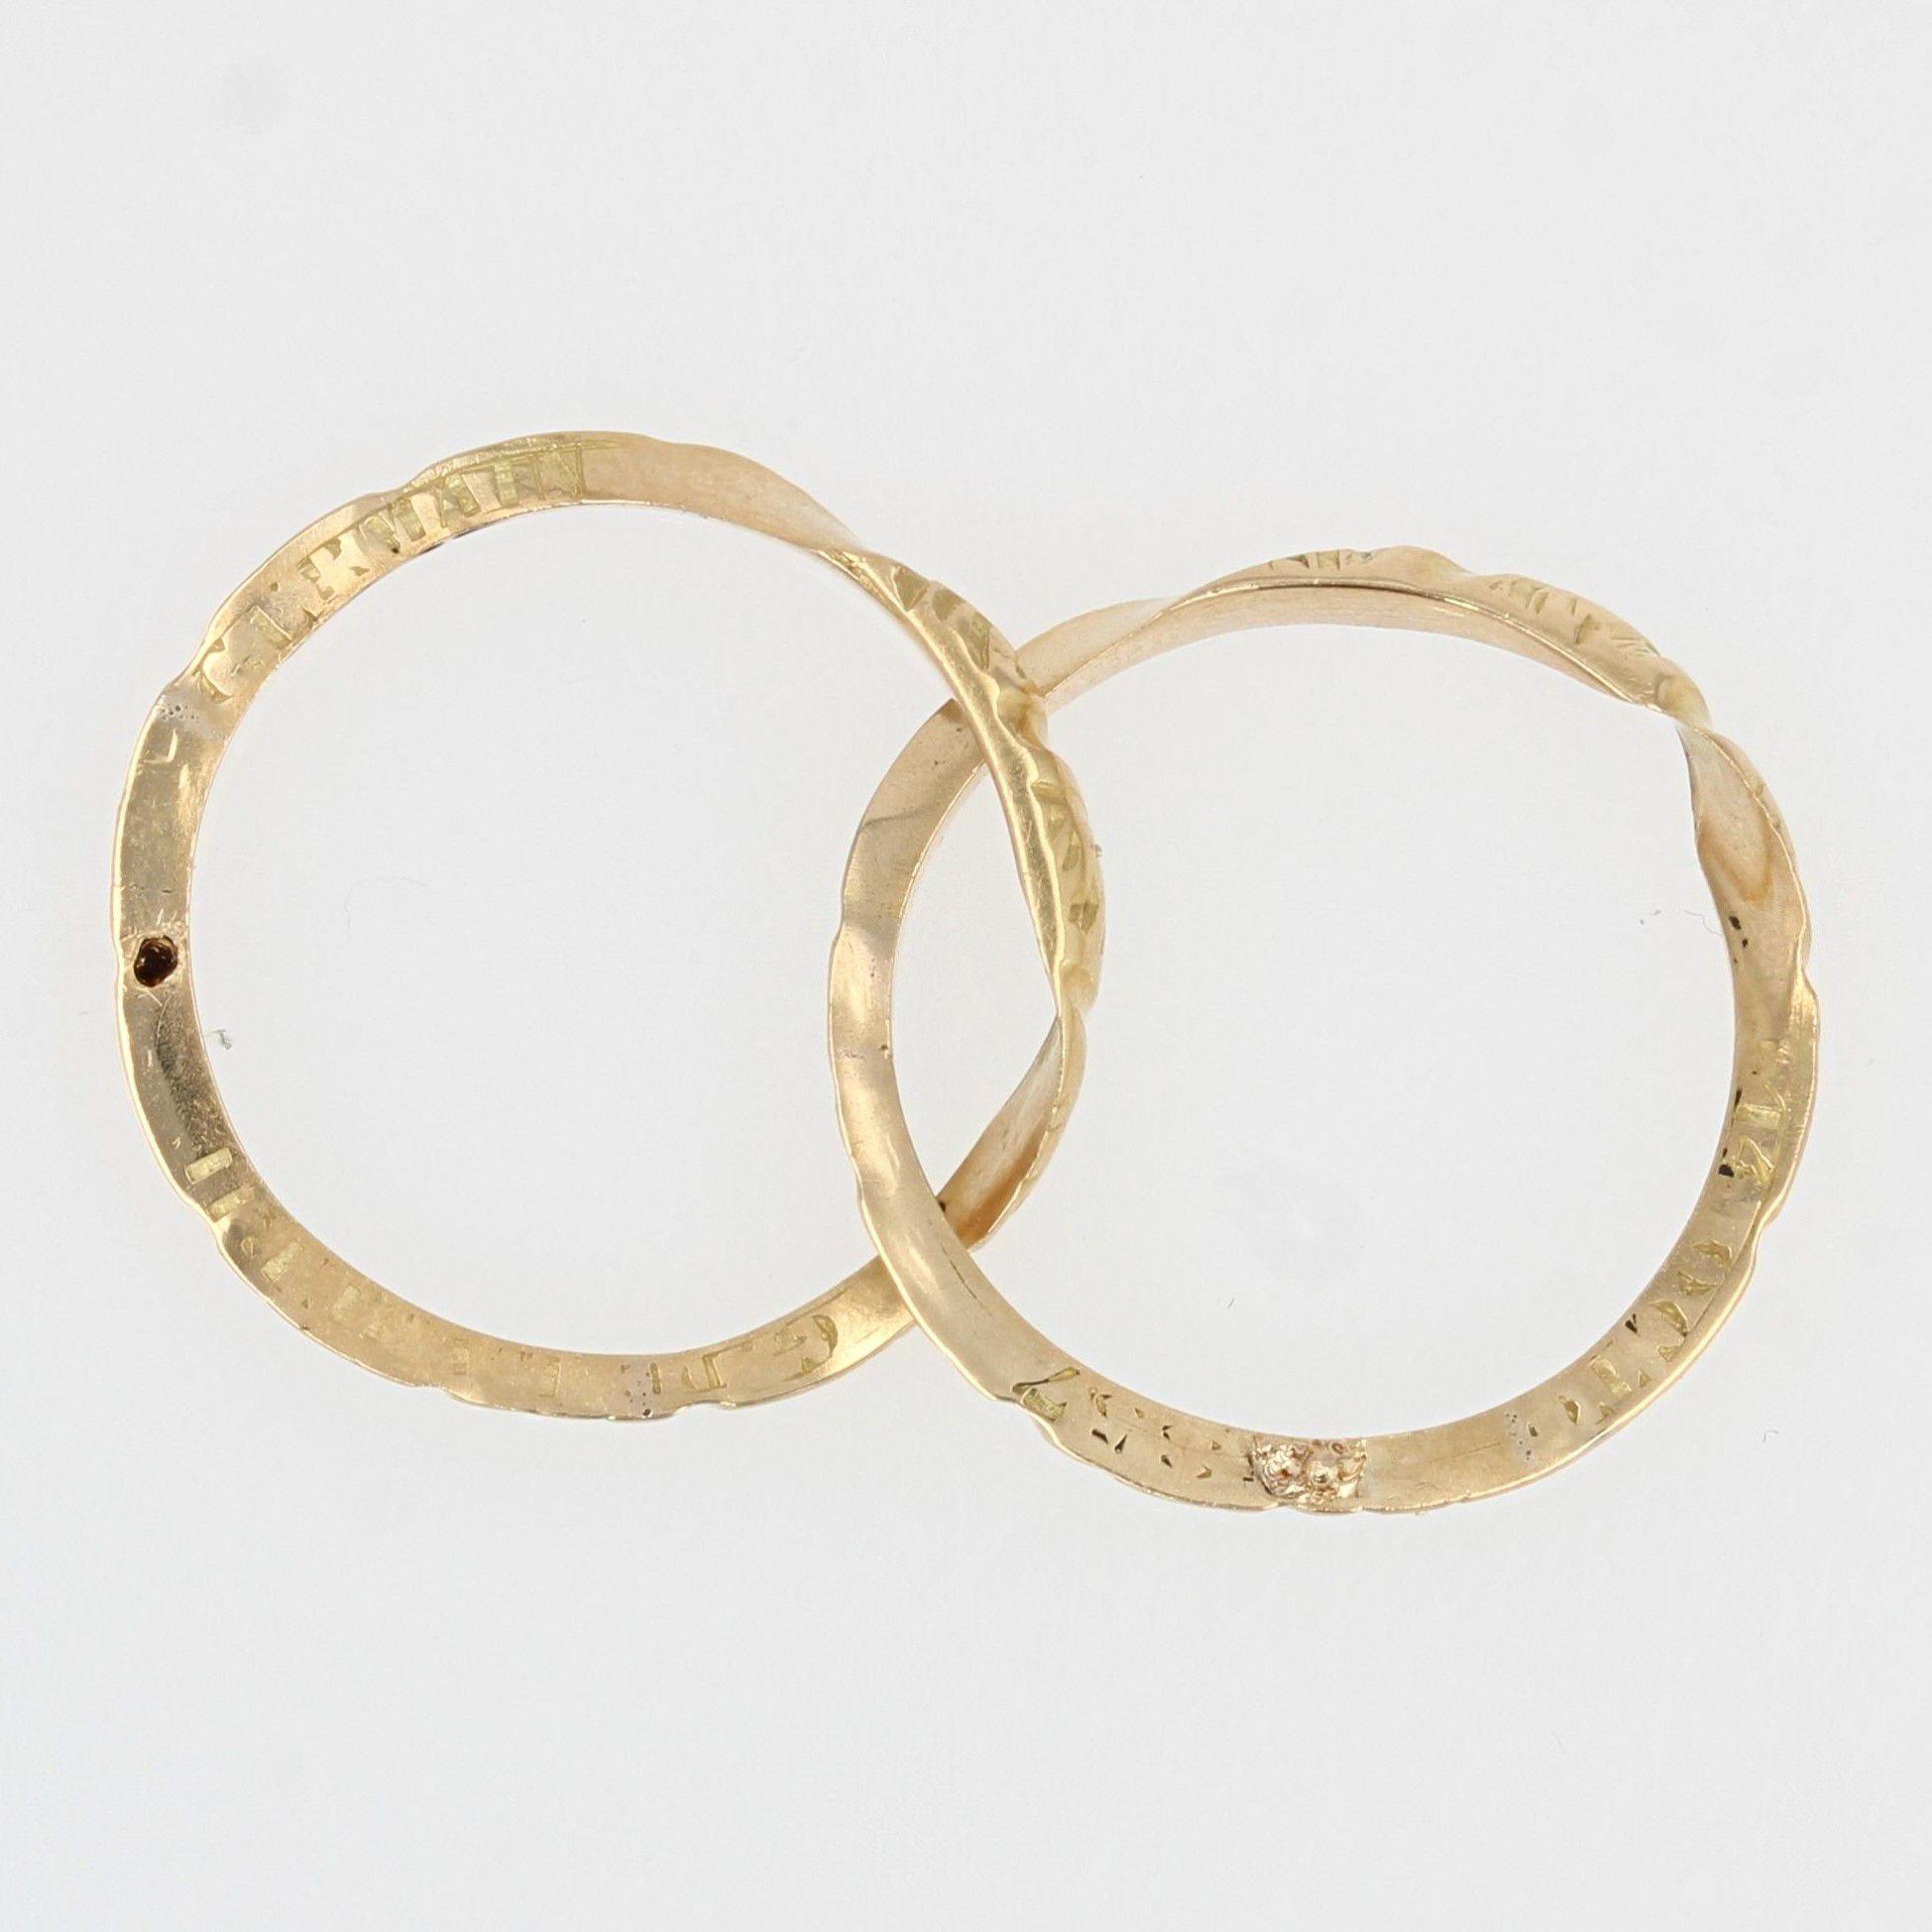 Alliance ancienne en or double anneau